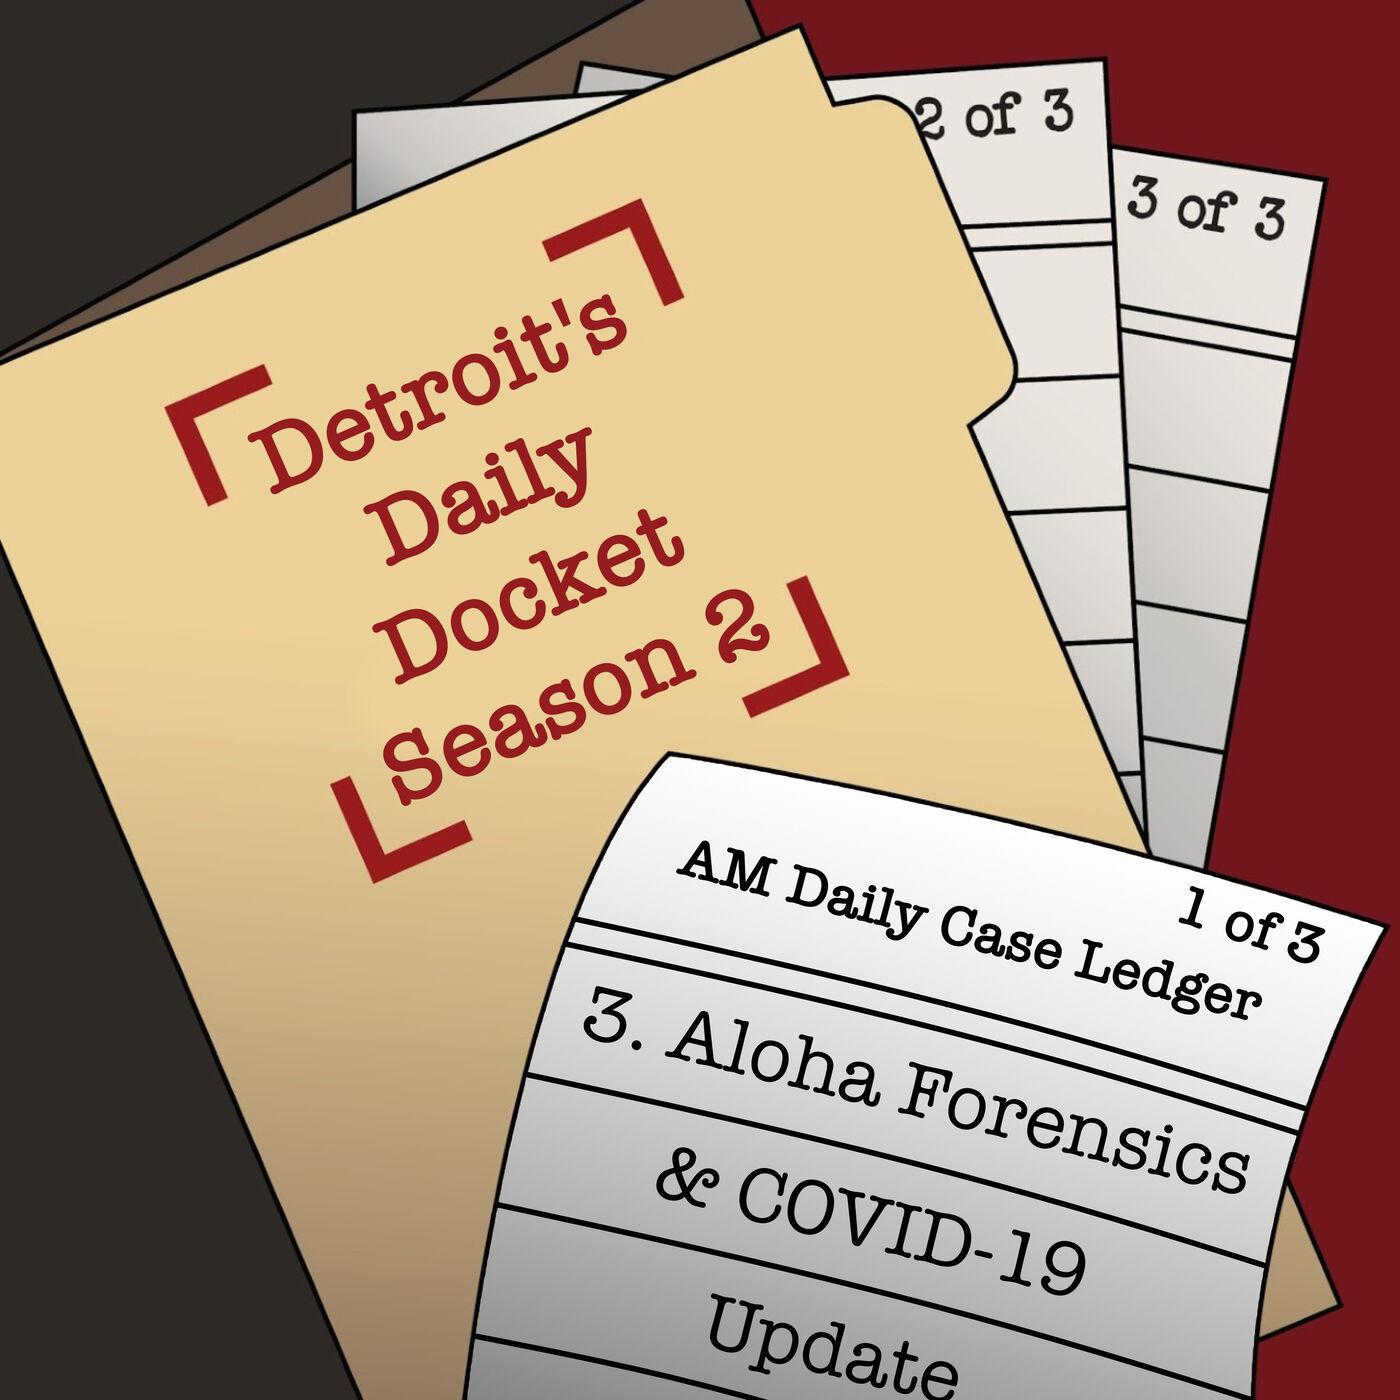 Aloha Forensics & COVID-19 Update